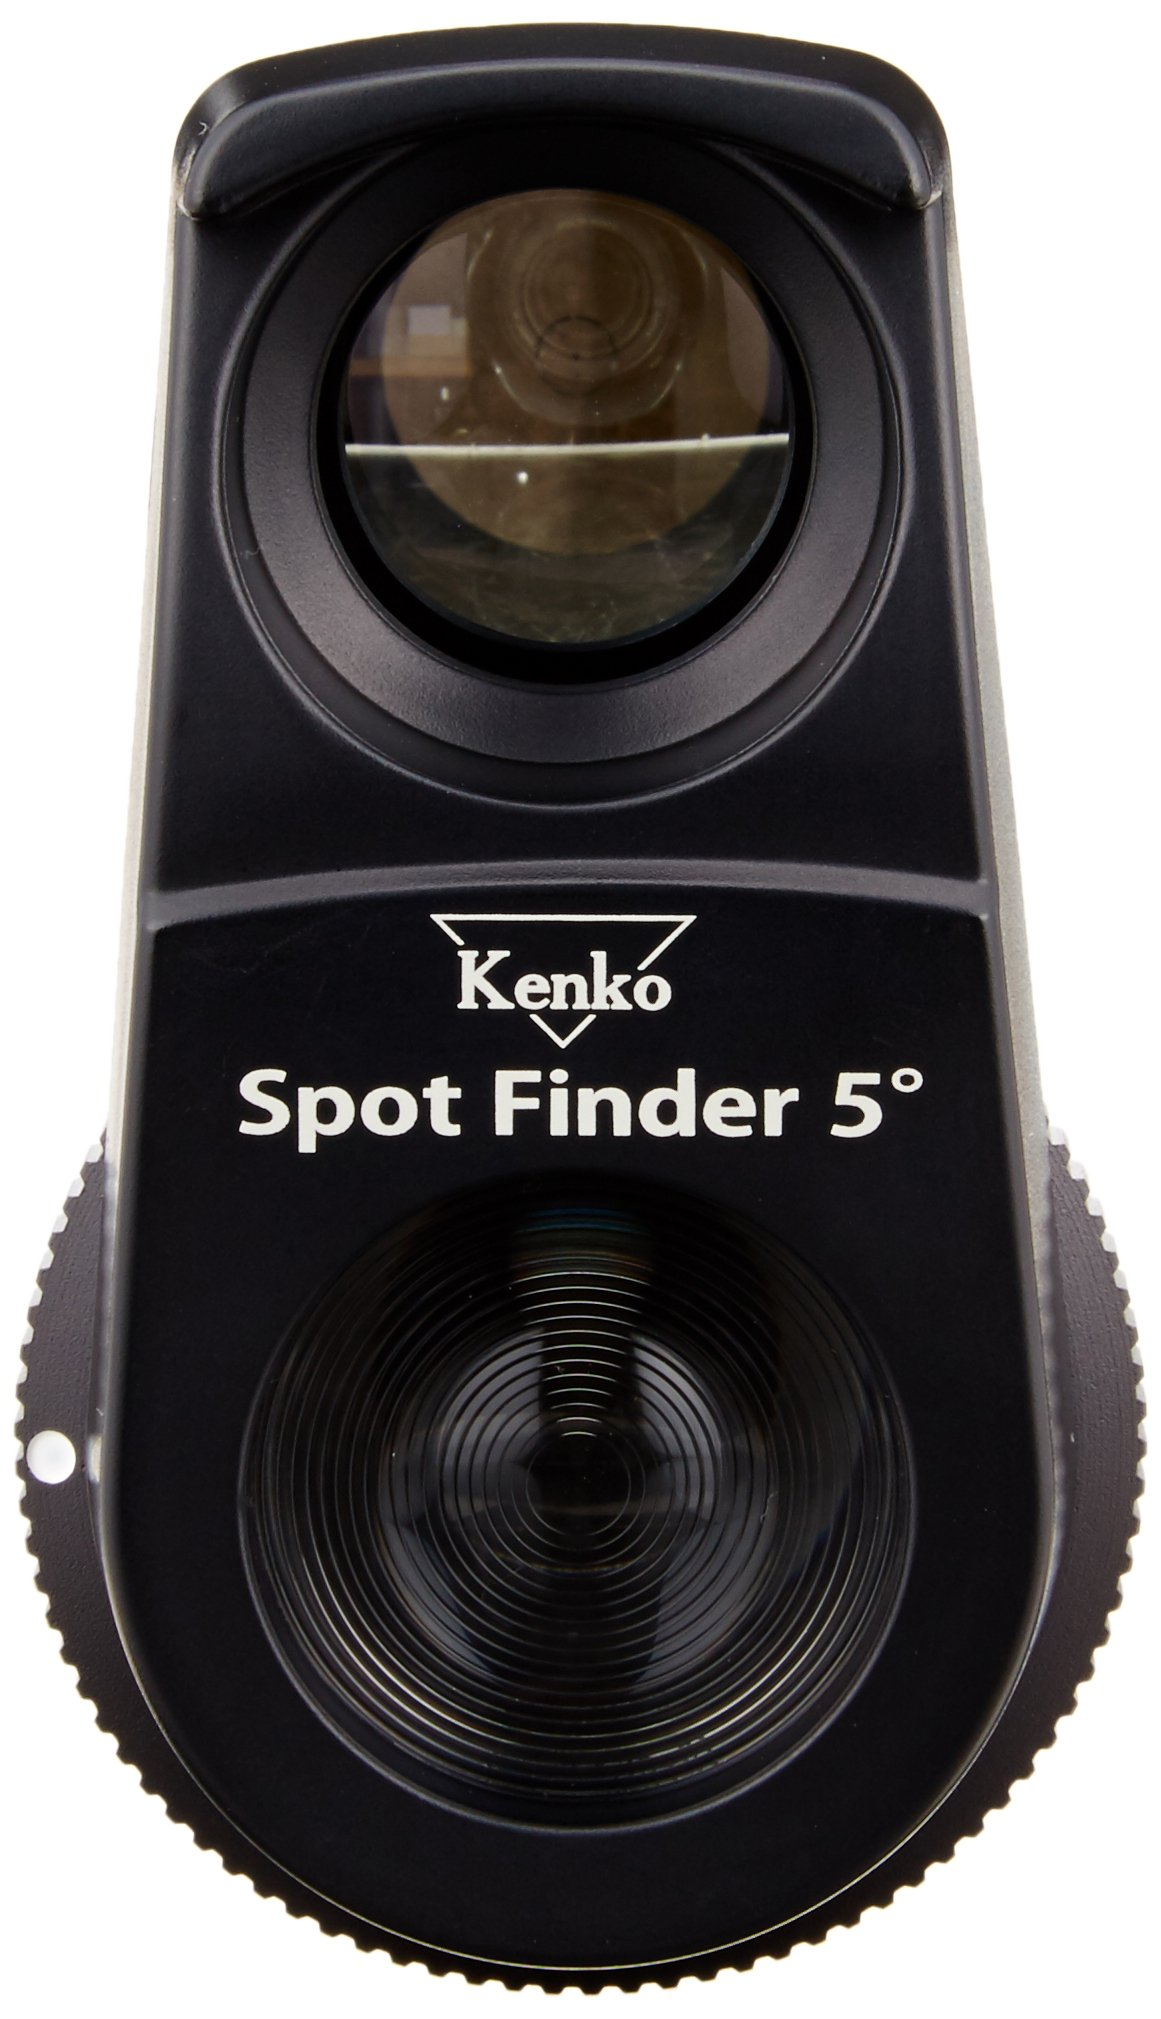 Kenko K-KFM-100 5 Degree Spotfinder for KFM-1100